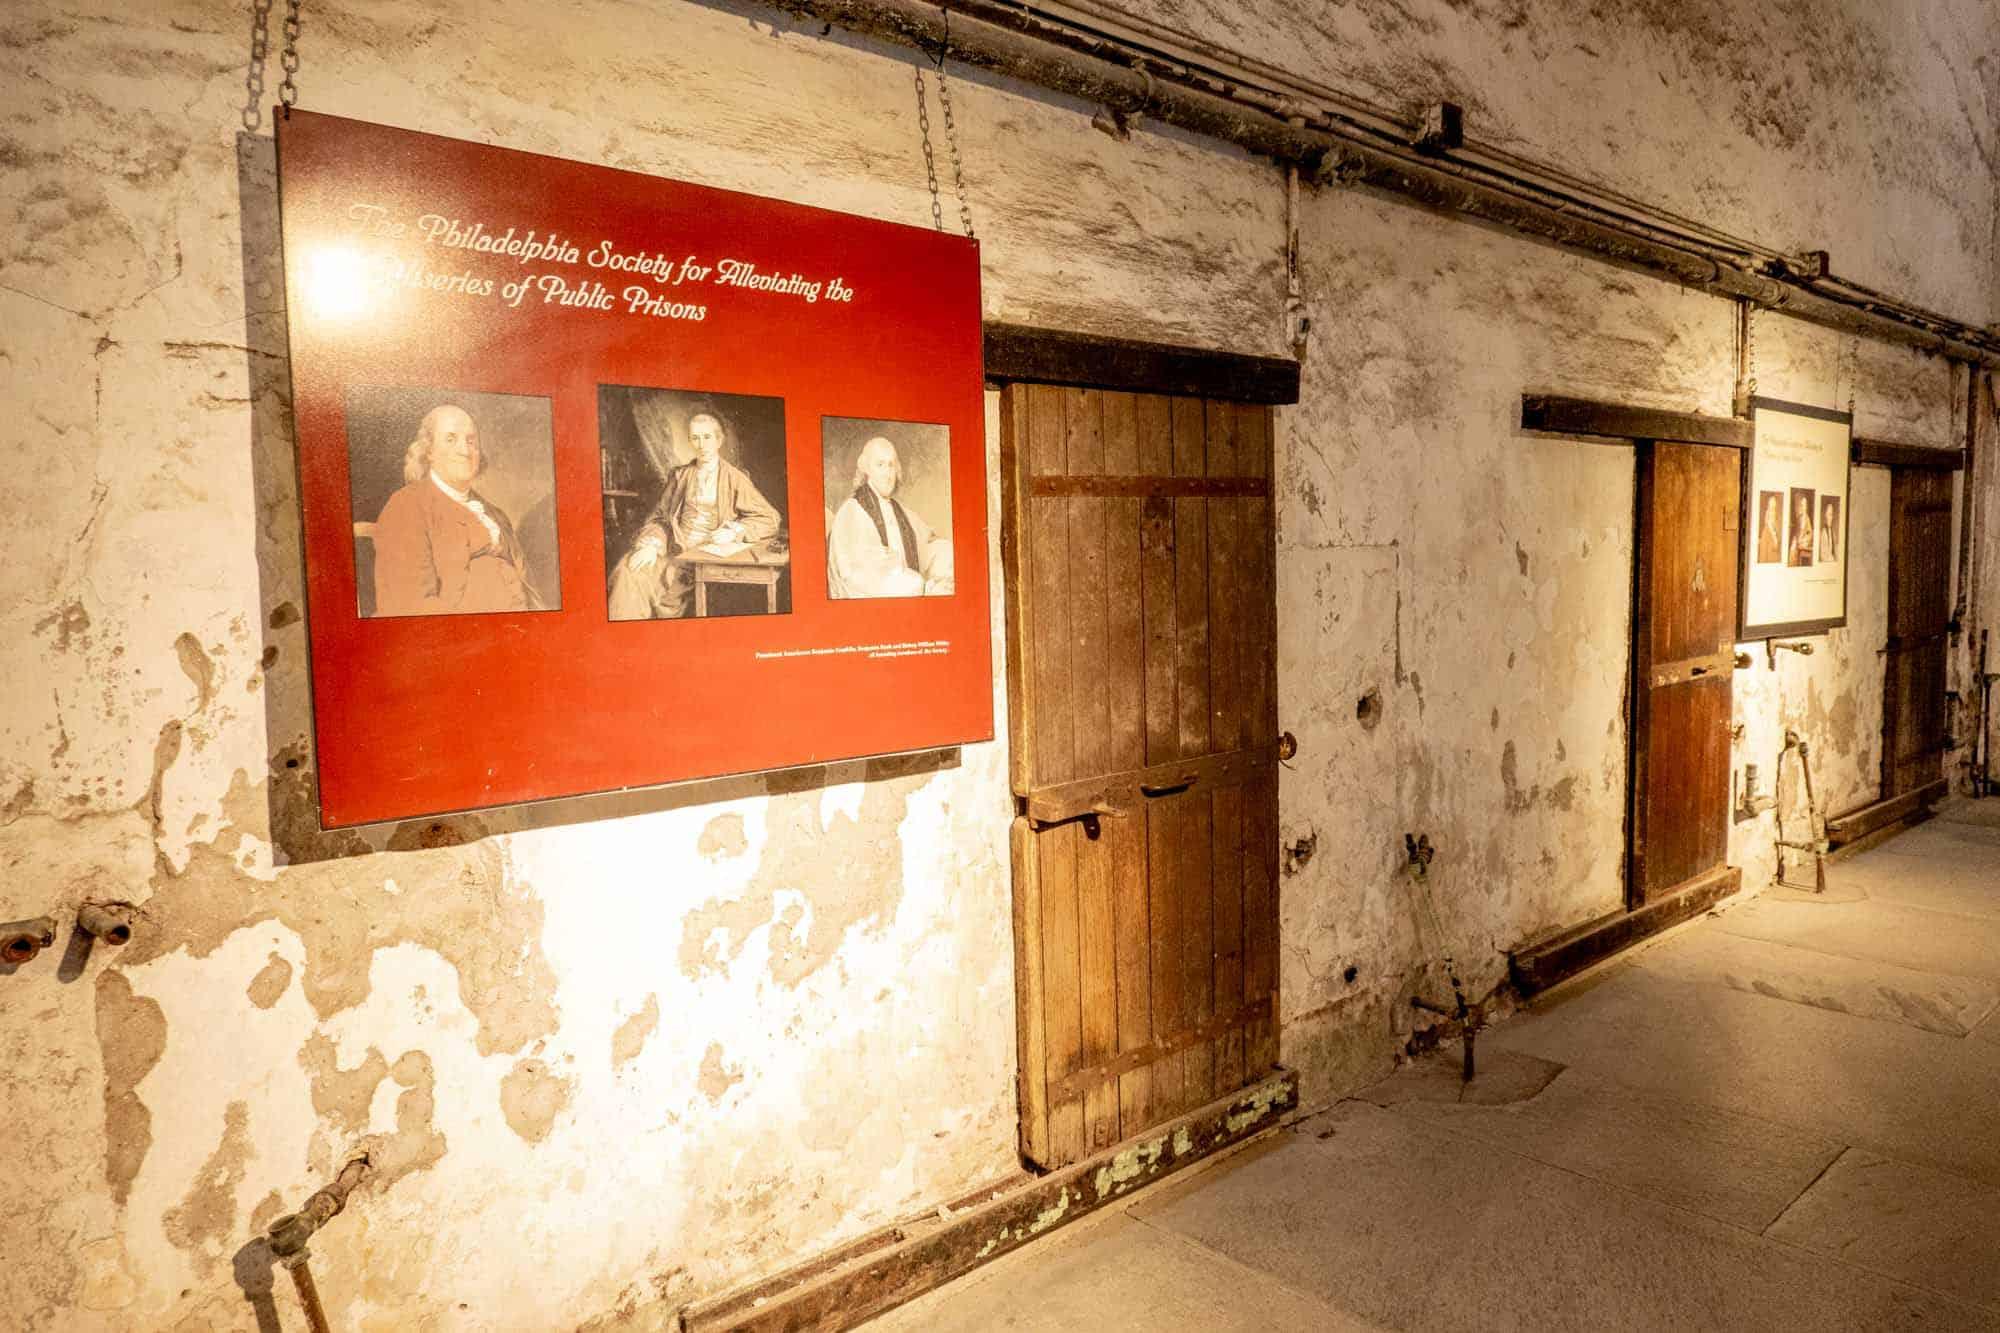 Information panel about Benjamin Franklin and prison reform